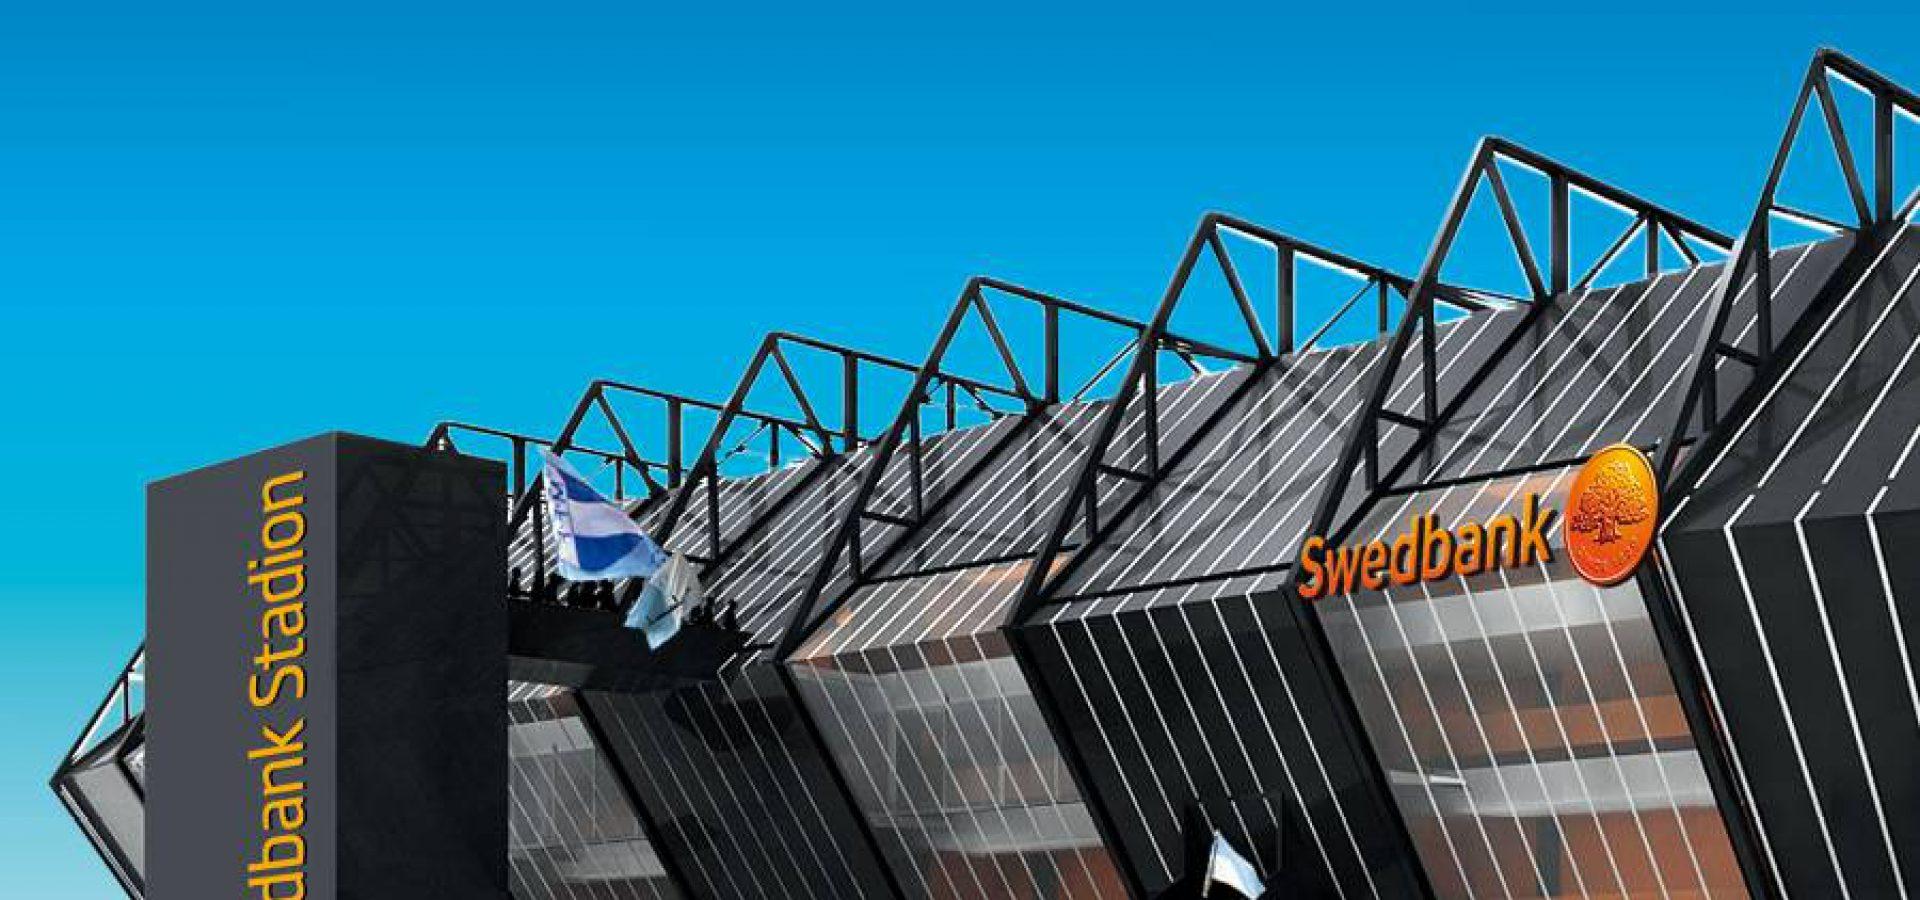 swedbank_stadion